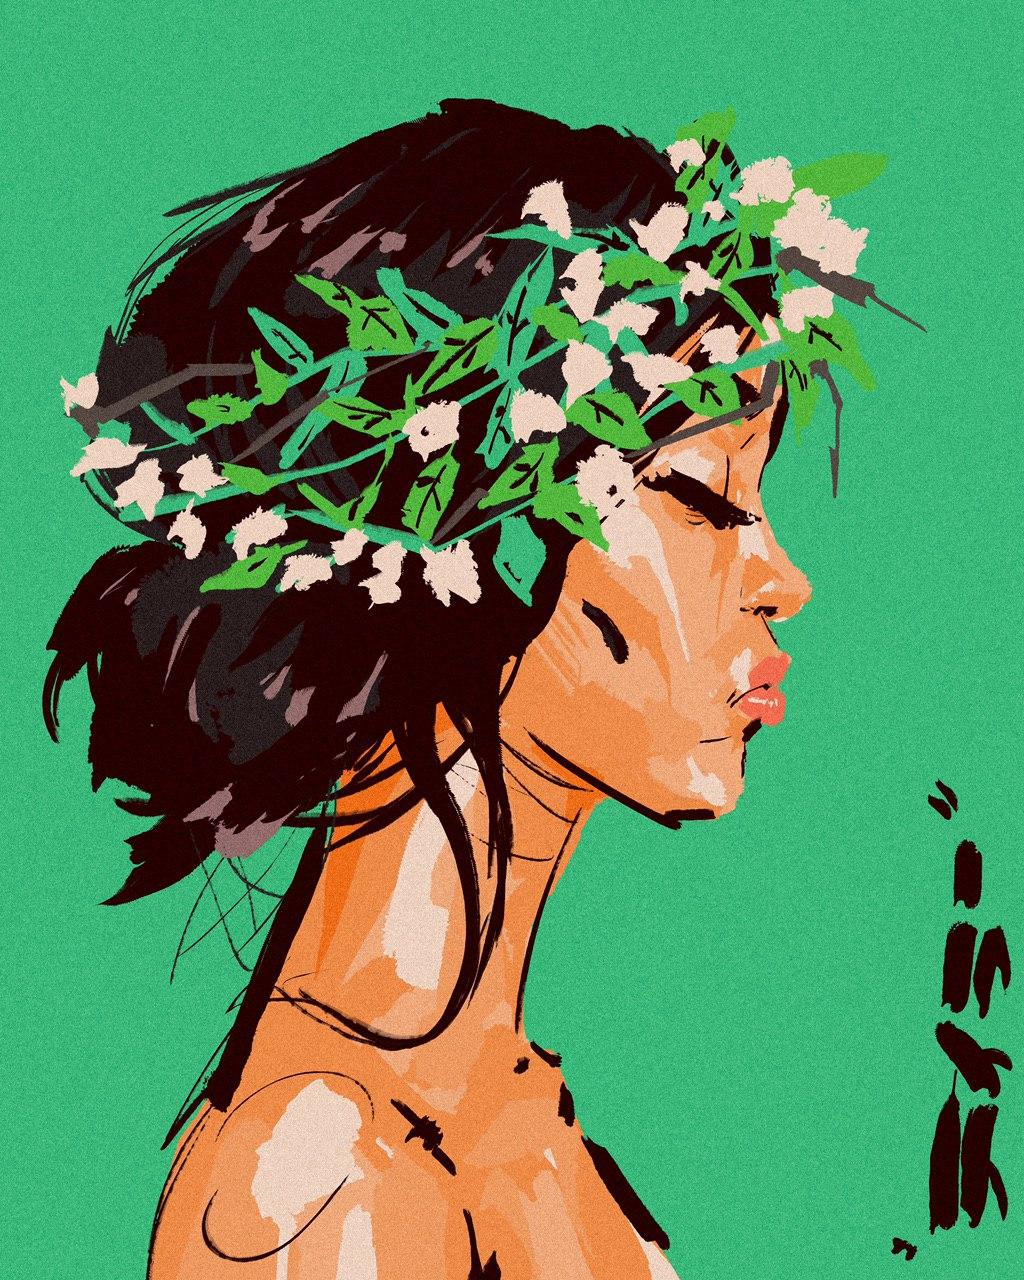 Evergreen by Kobina